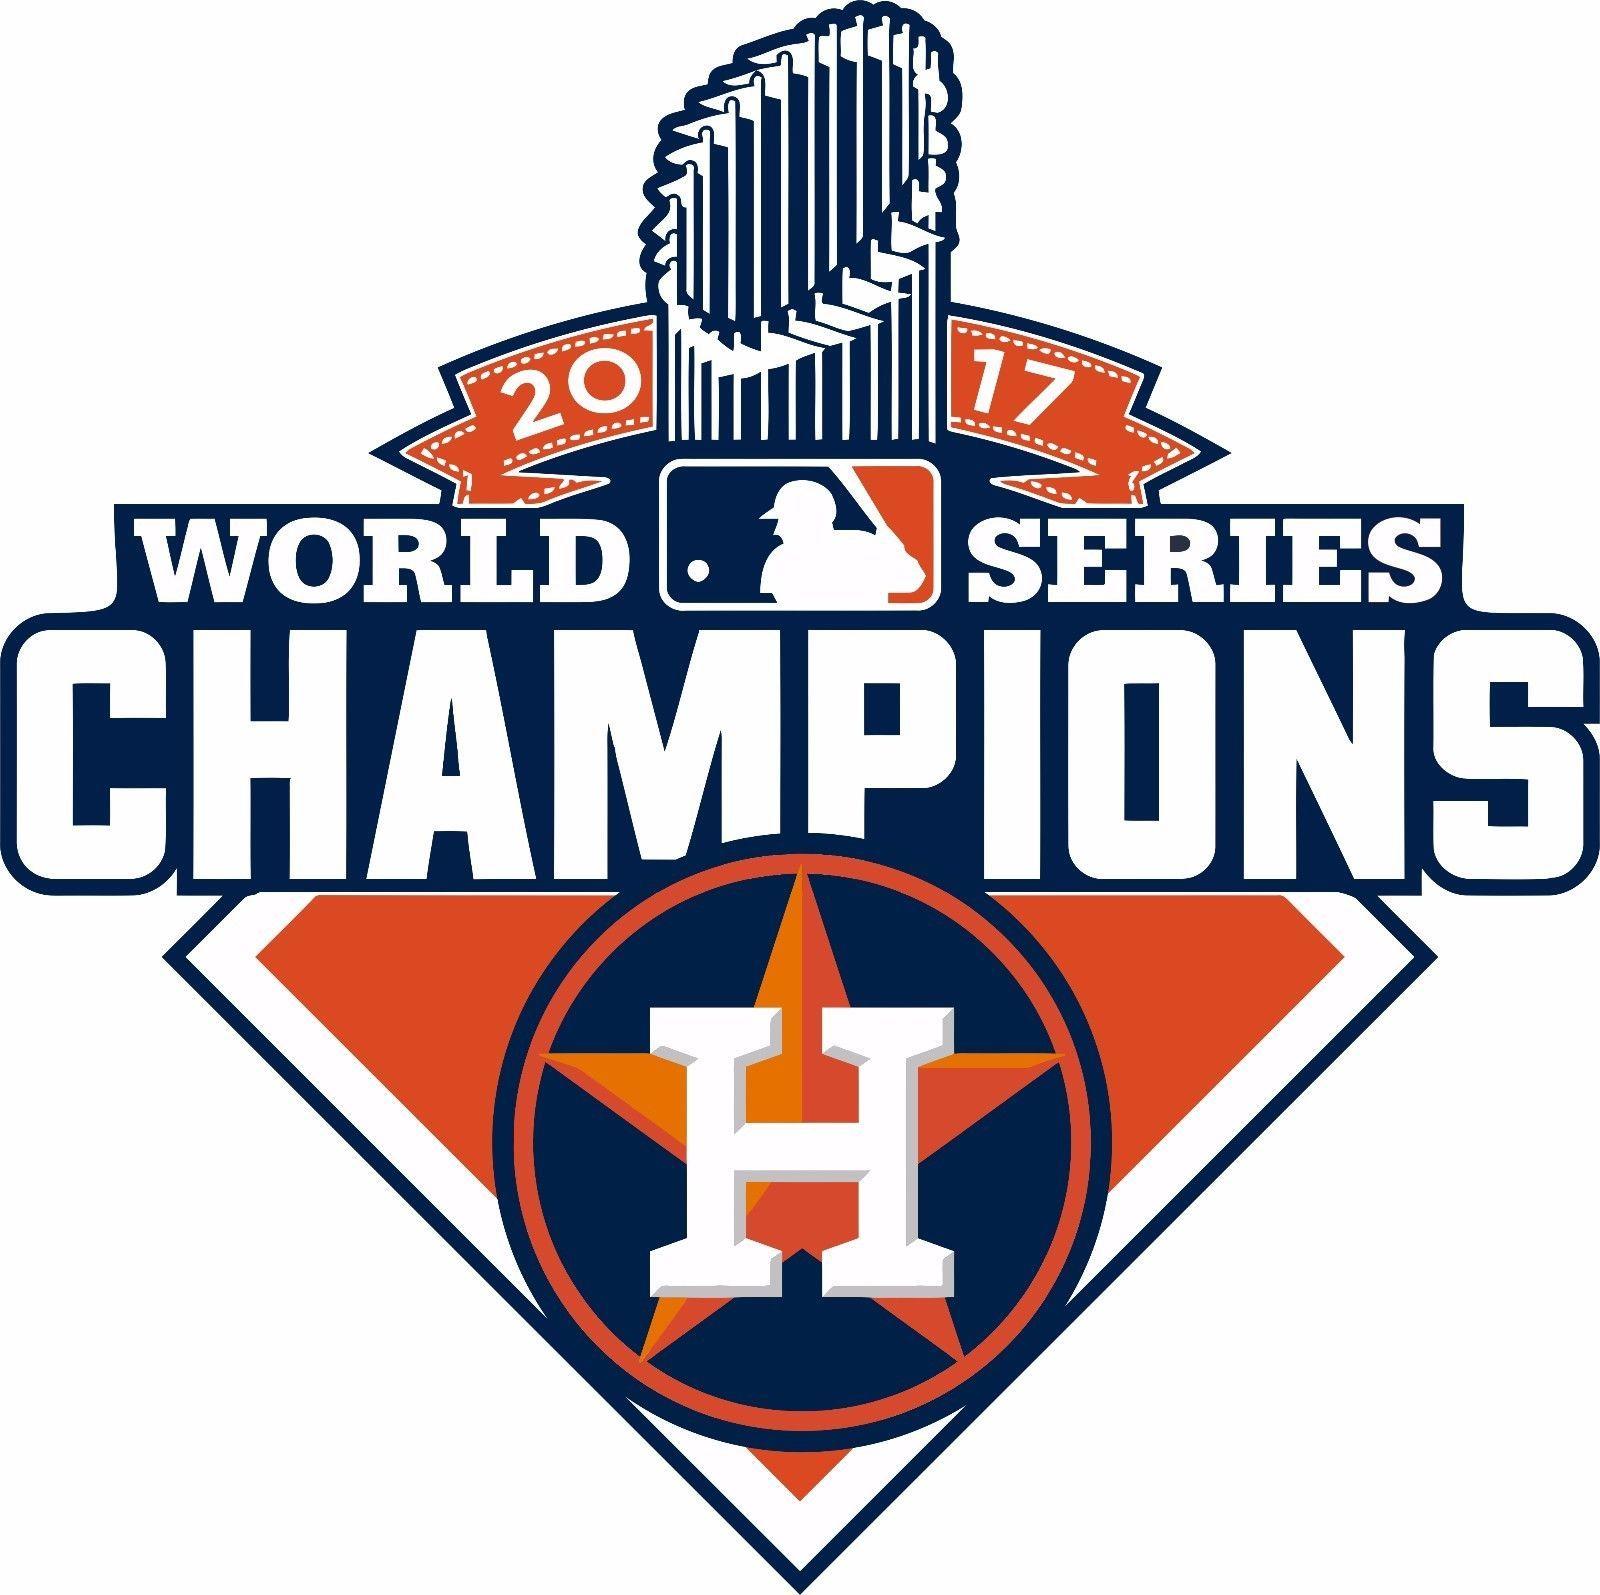 2.99 Houston Astros World Series Champions 2017 Decal